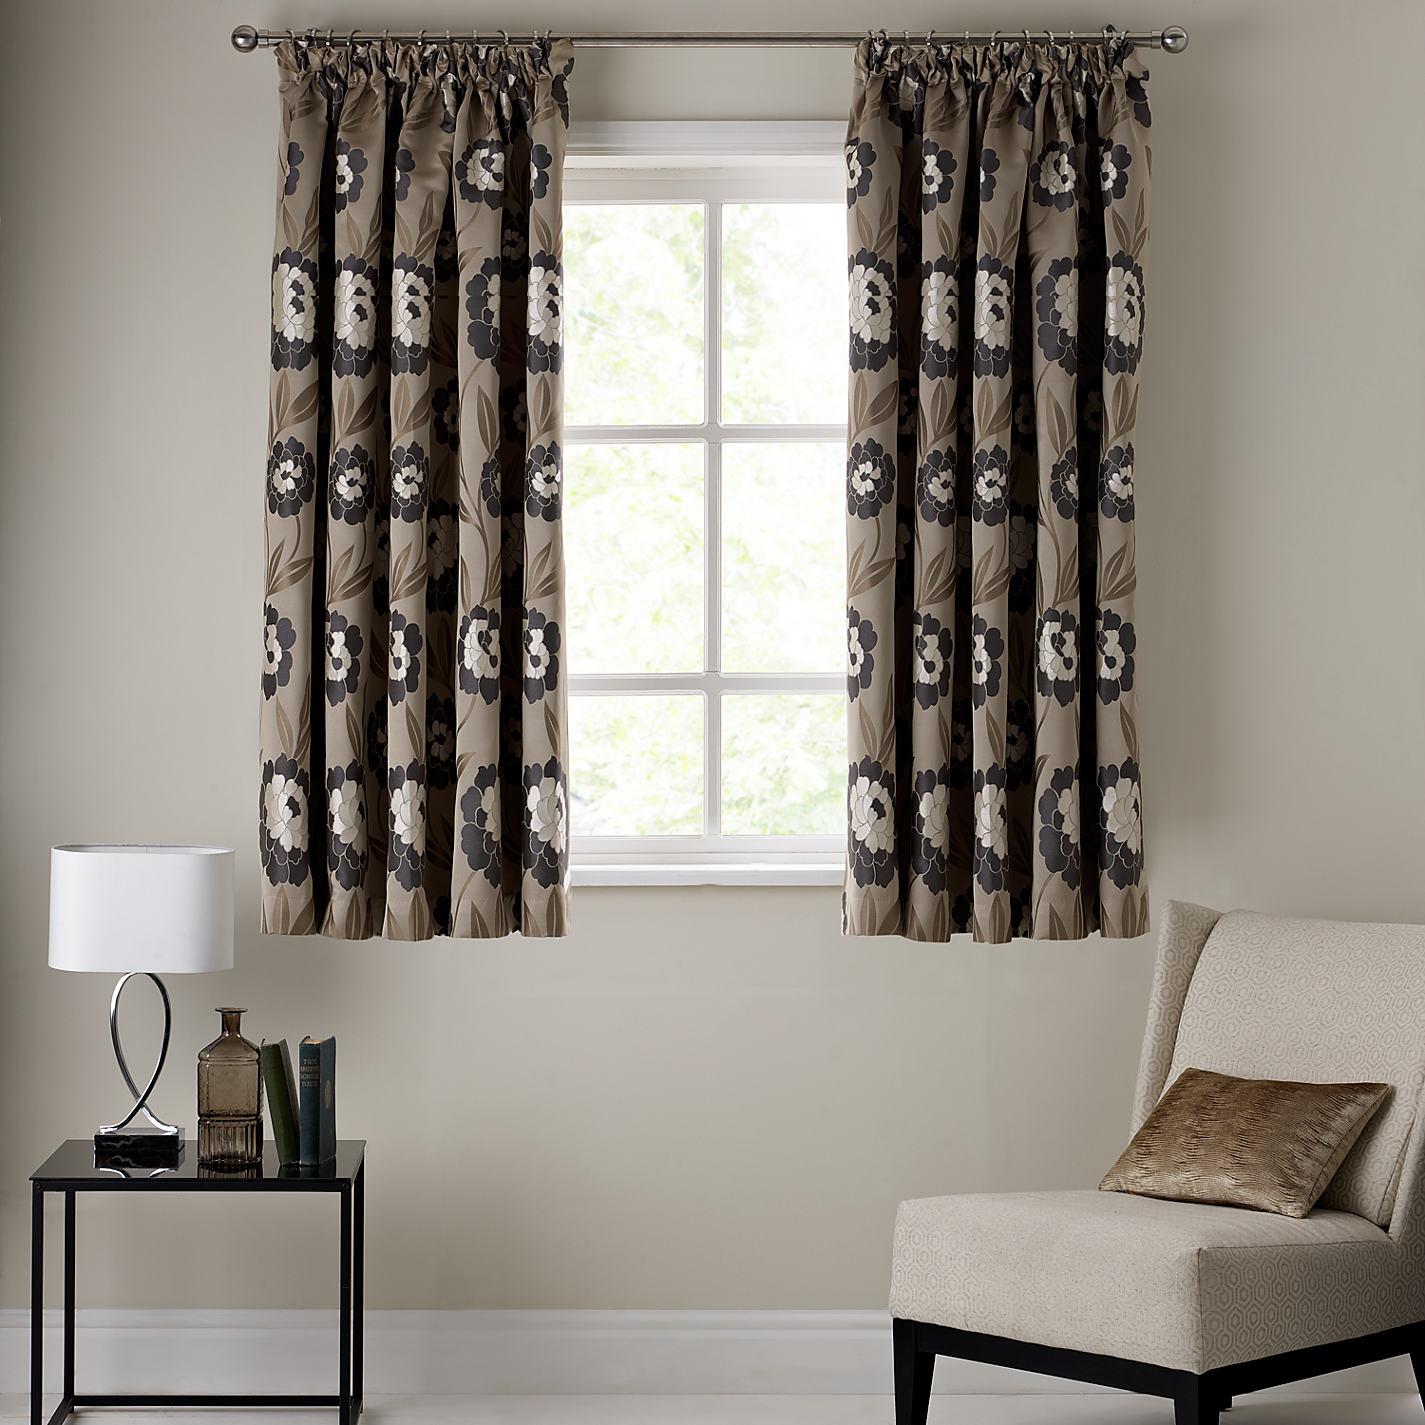 Tende per interni casa tessuti soluzioni colori e - Tende per finestre interne ...